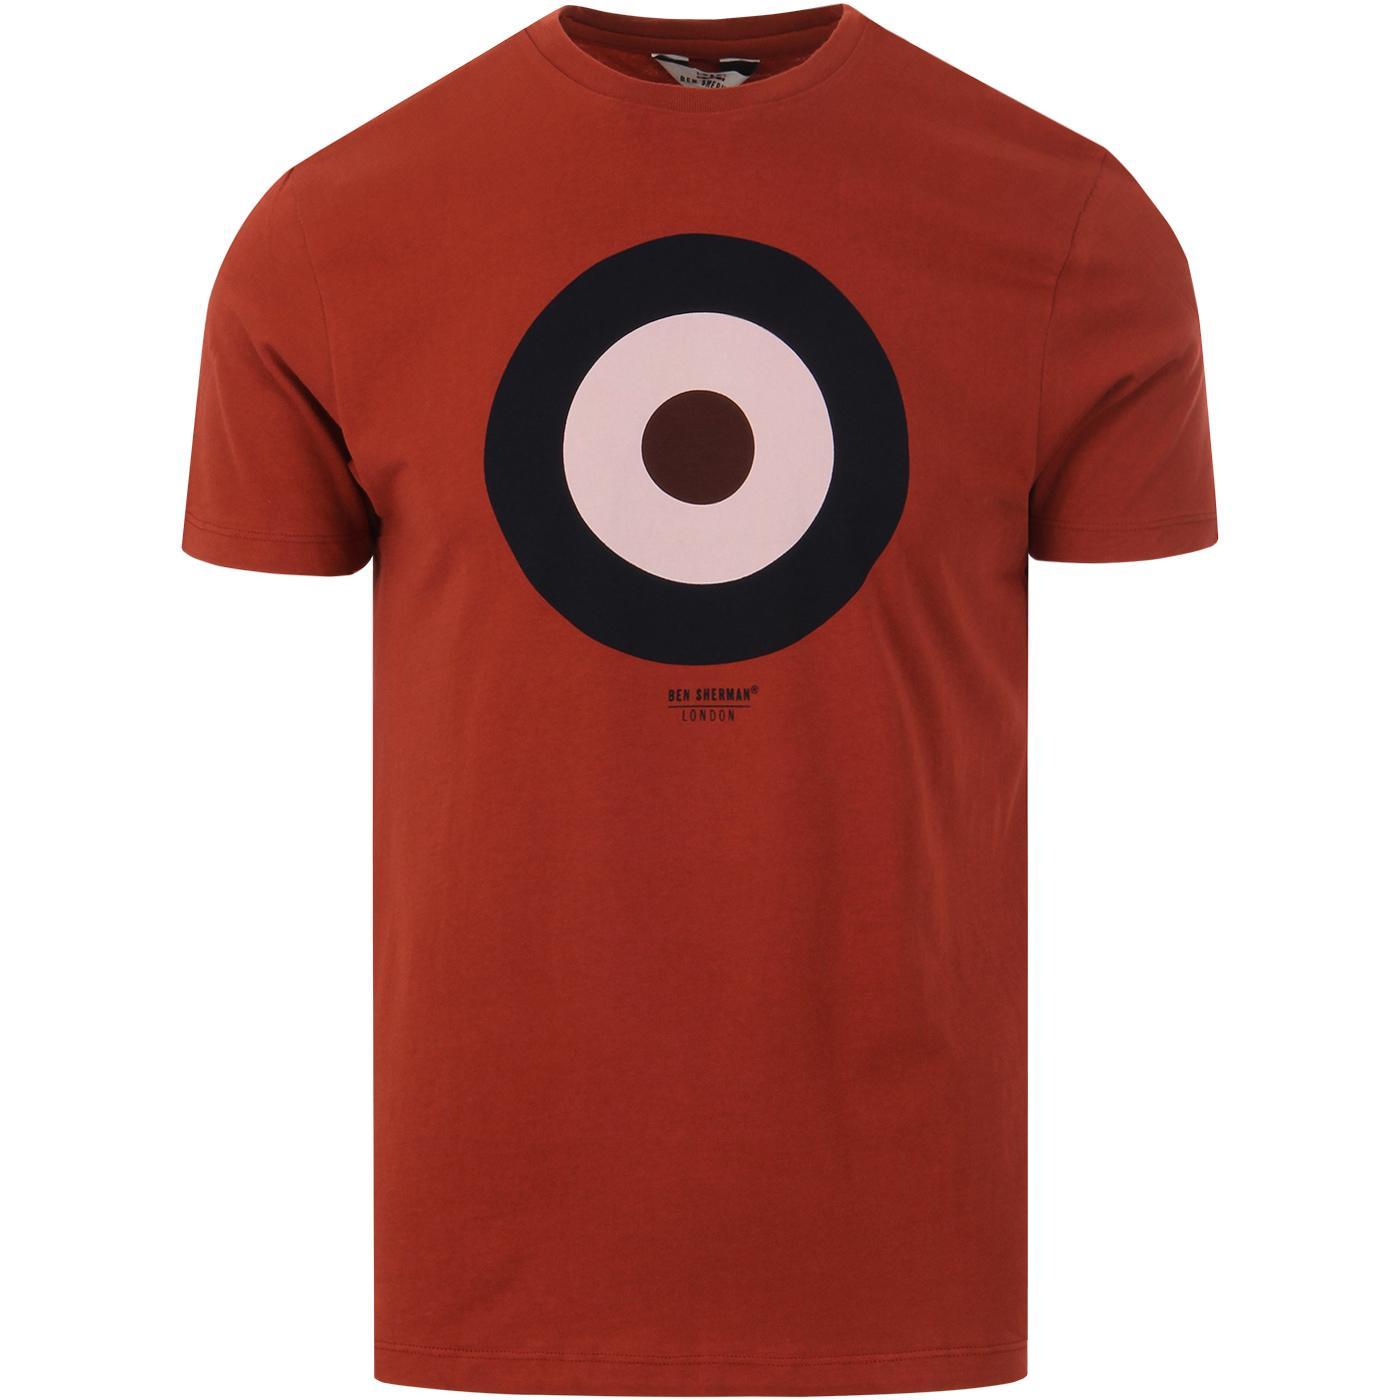 BEN SHERMAN Retro 1960s Mod Target T-shirt (Rust)